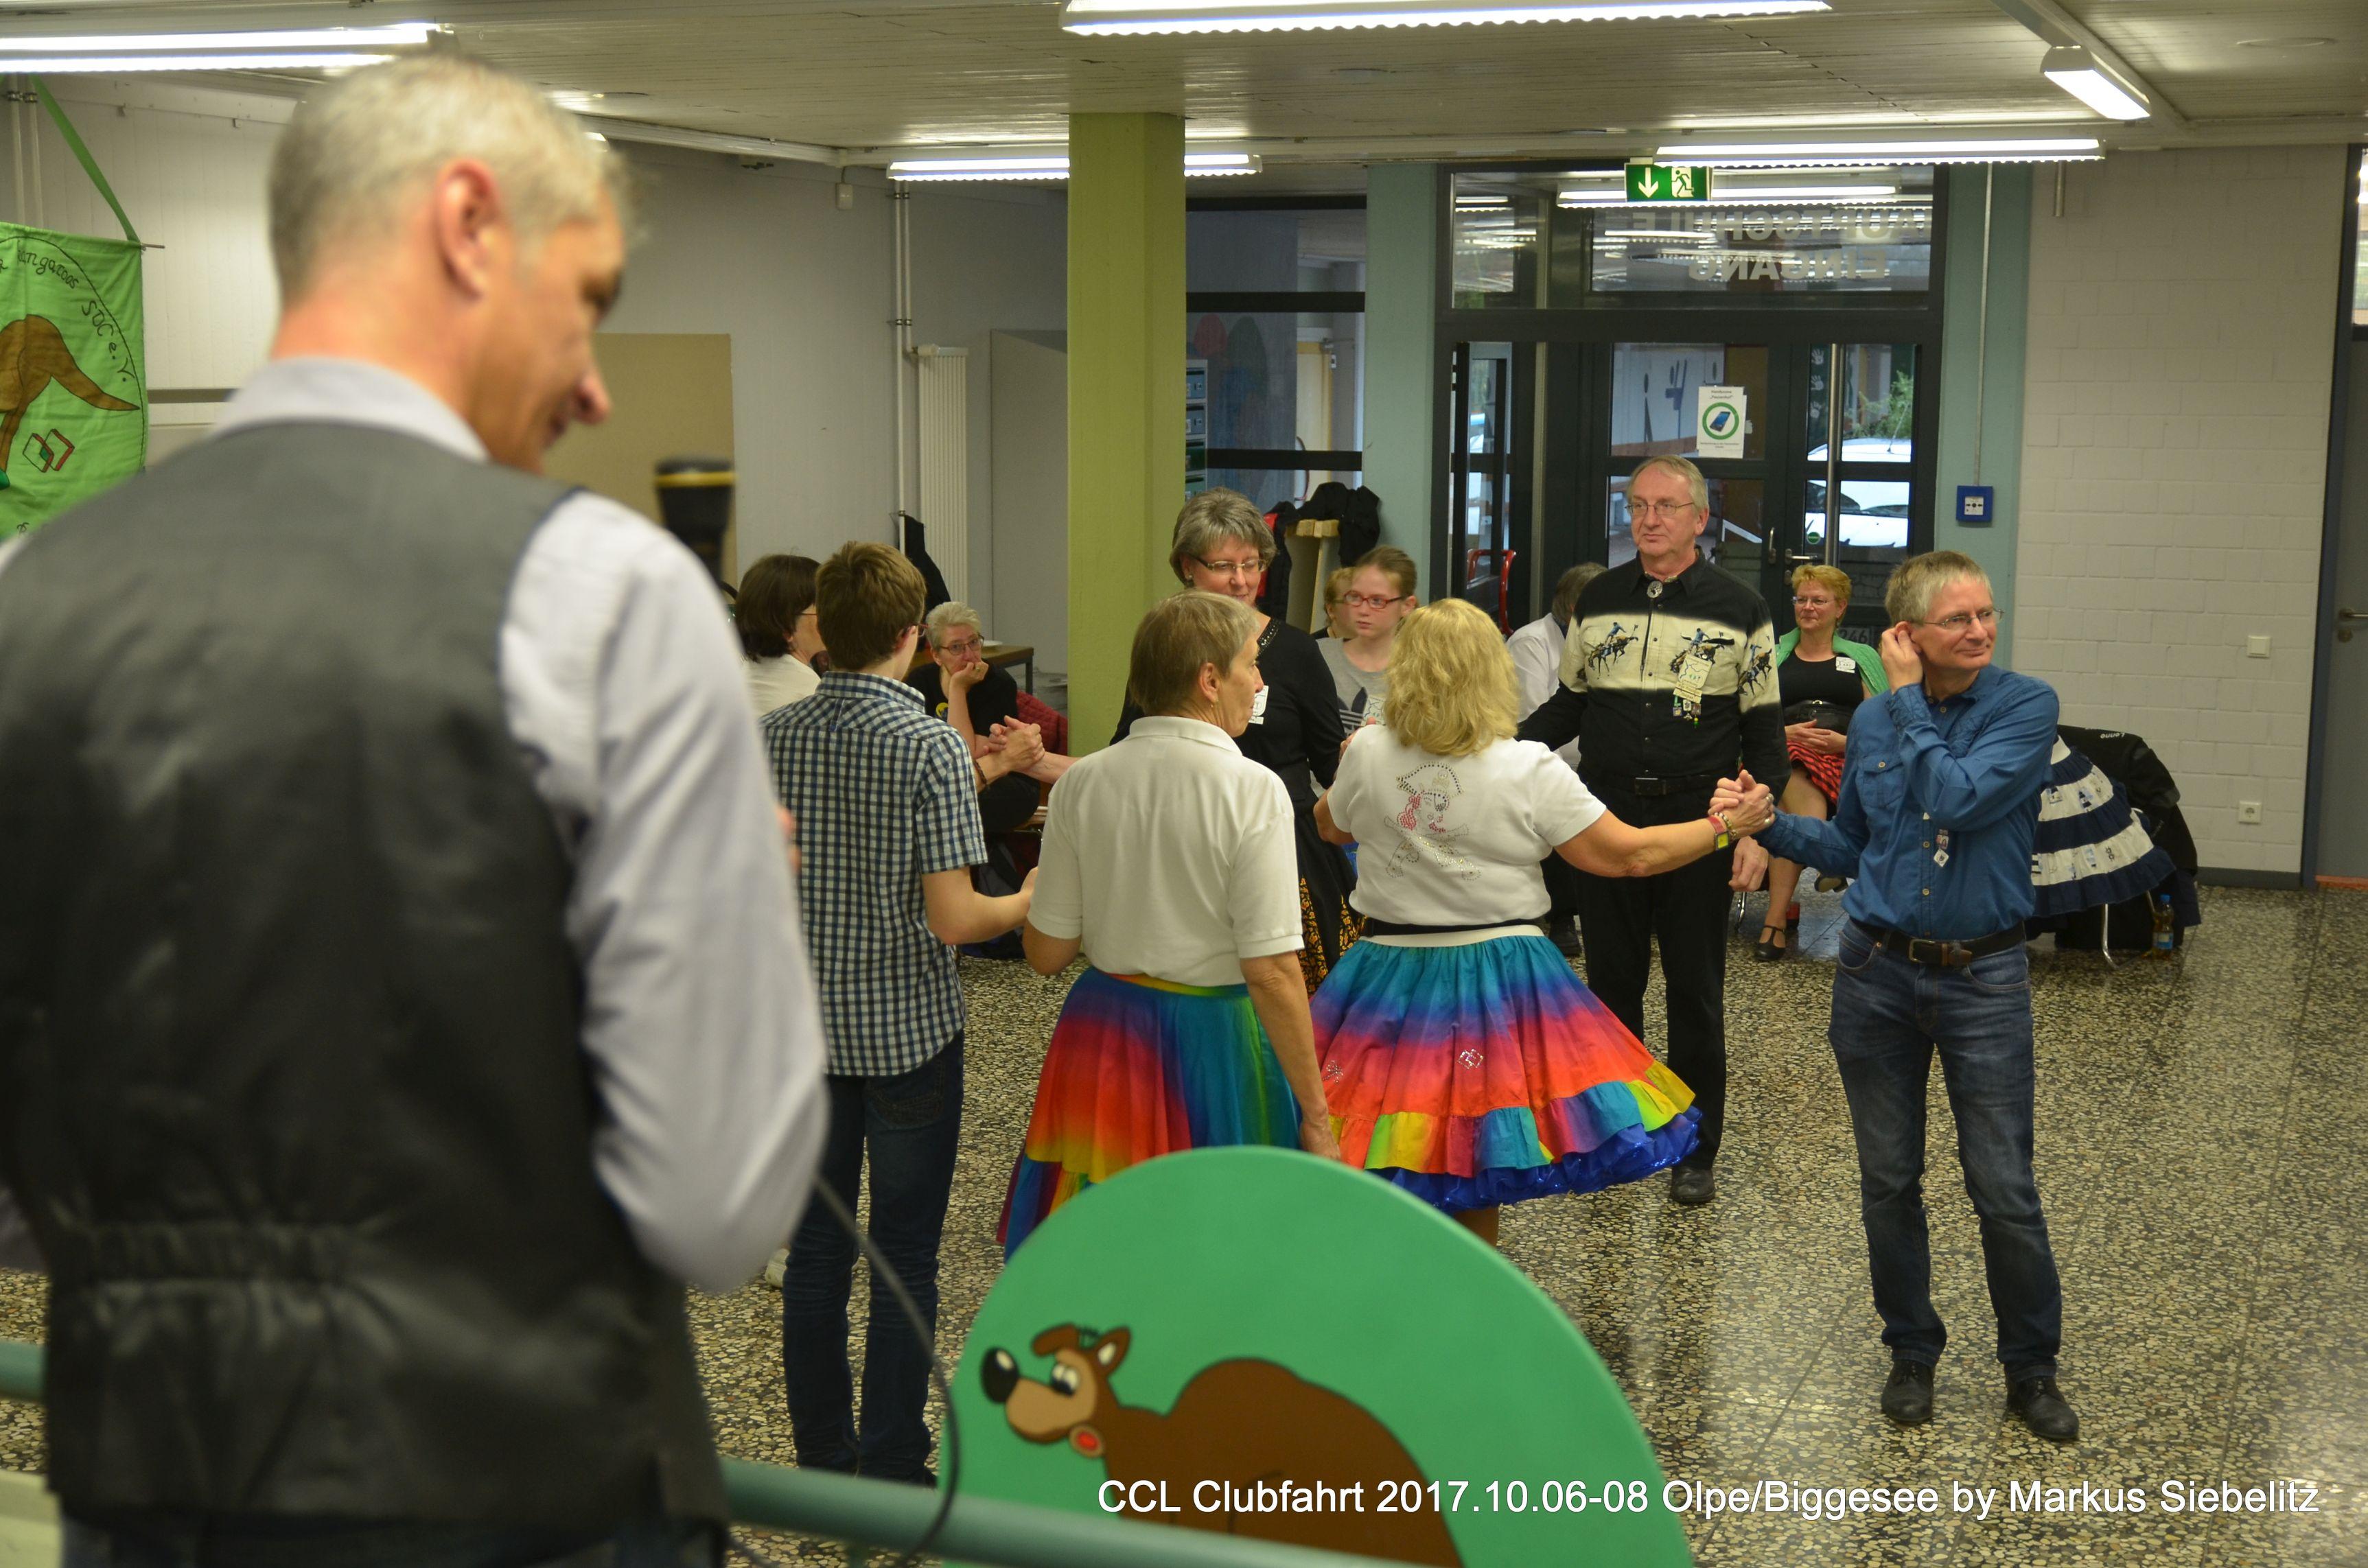 CCL Clubfahrt 2017.10.06-08 Biggesee (38)